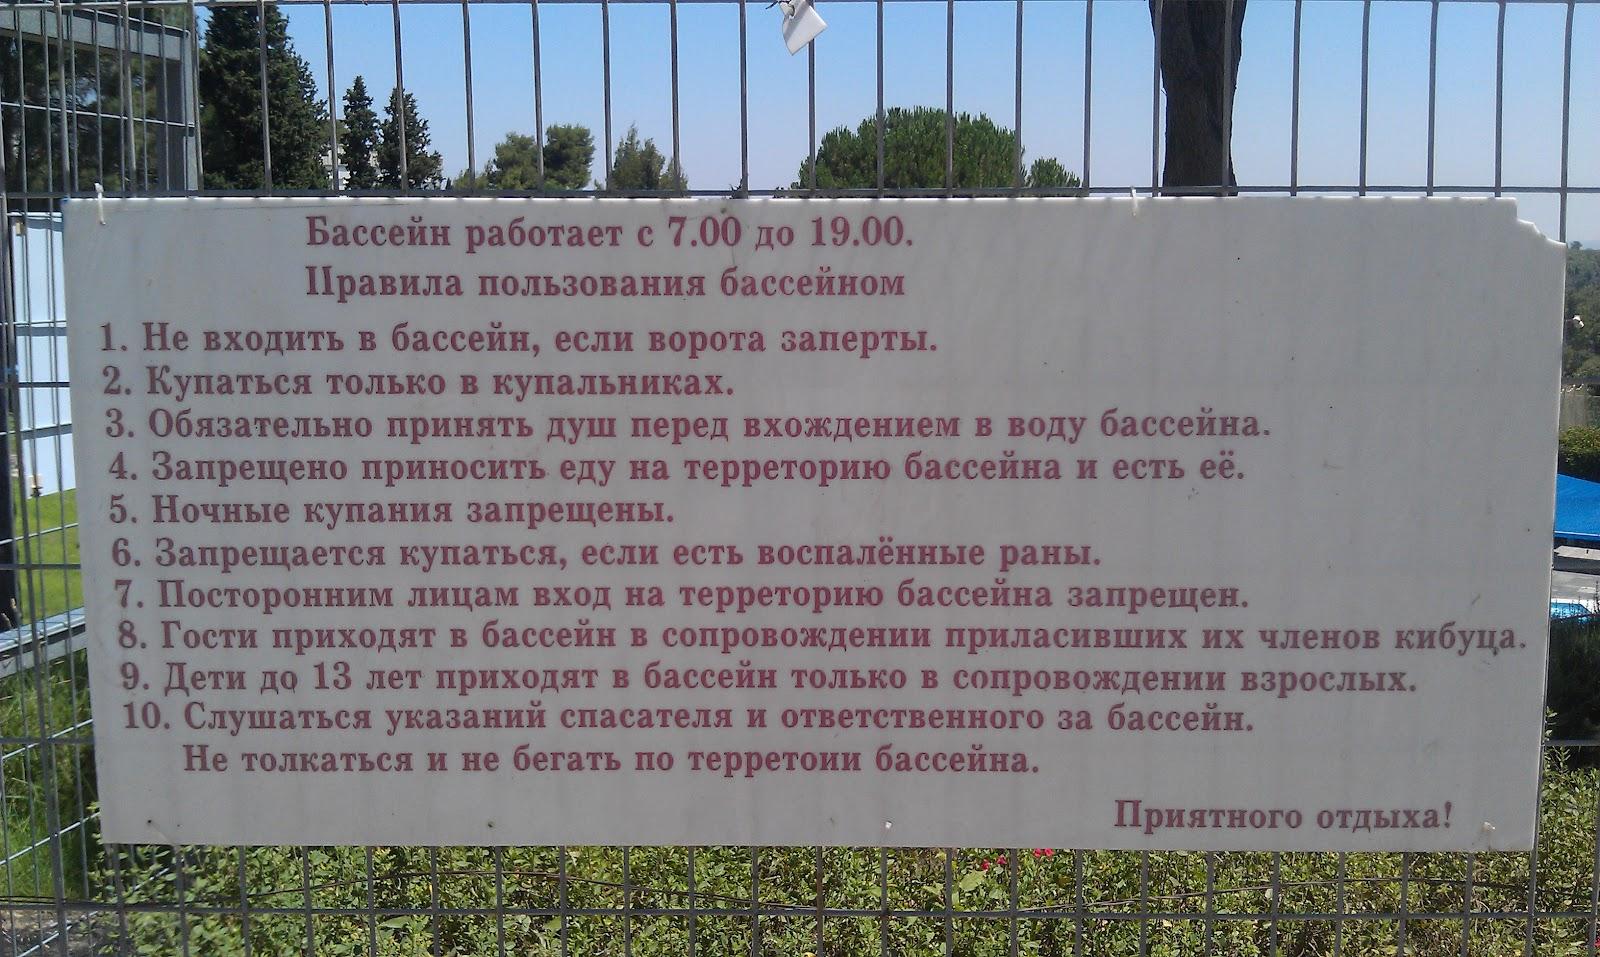 Елените болгария вилла астория